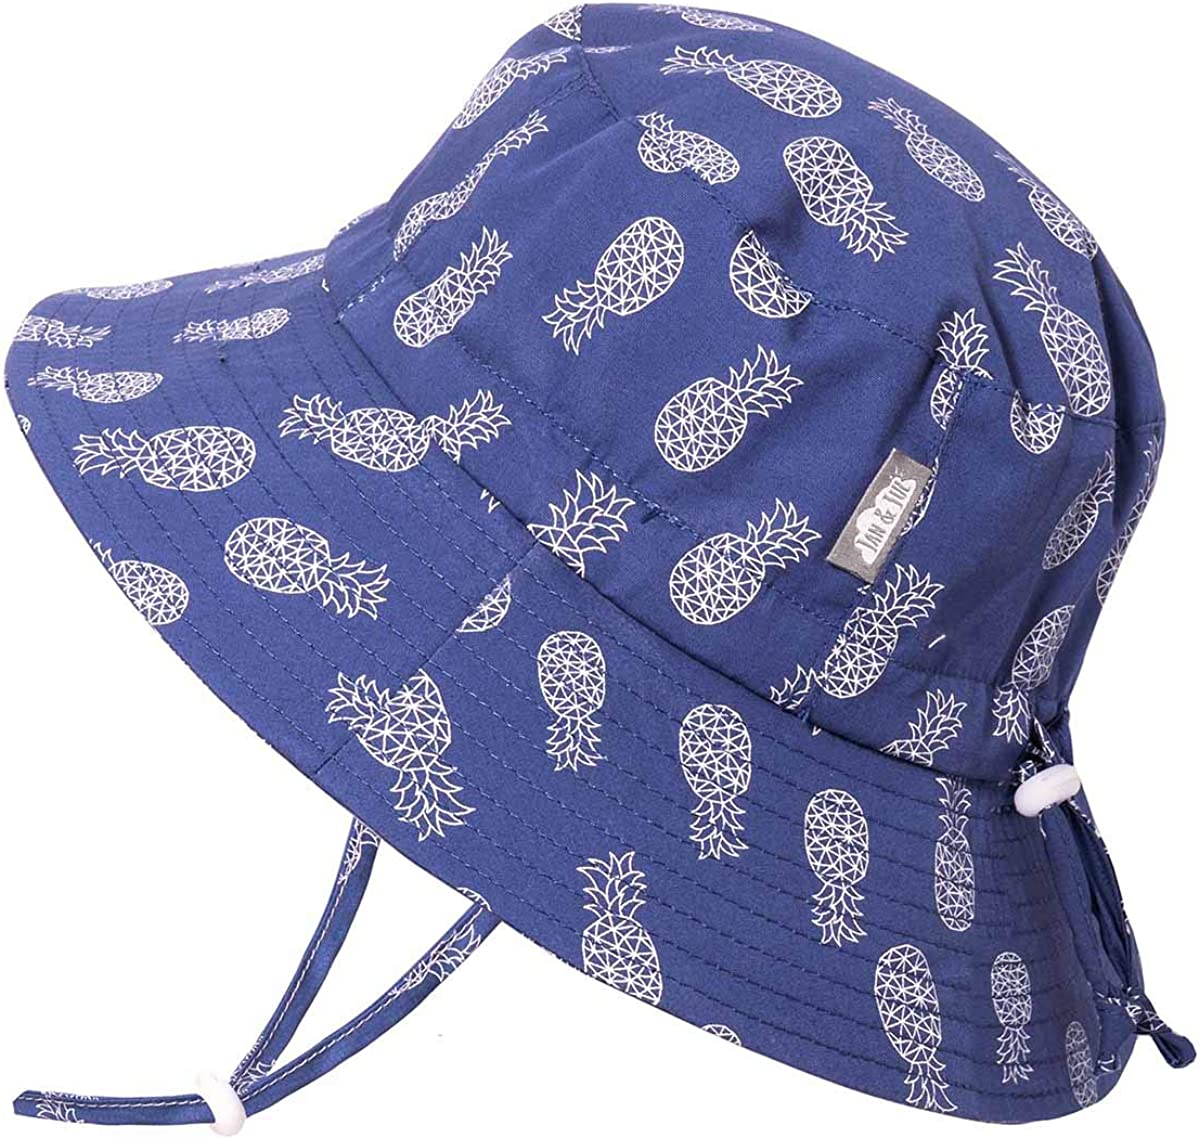 JAN & JUL Boys' GRO-with-Me Adjustable Bucket Sun-Hat, UPF 50+ Breathable Cotton